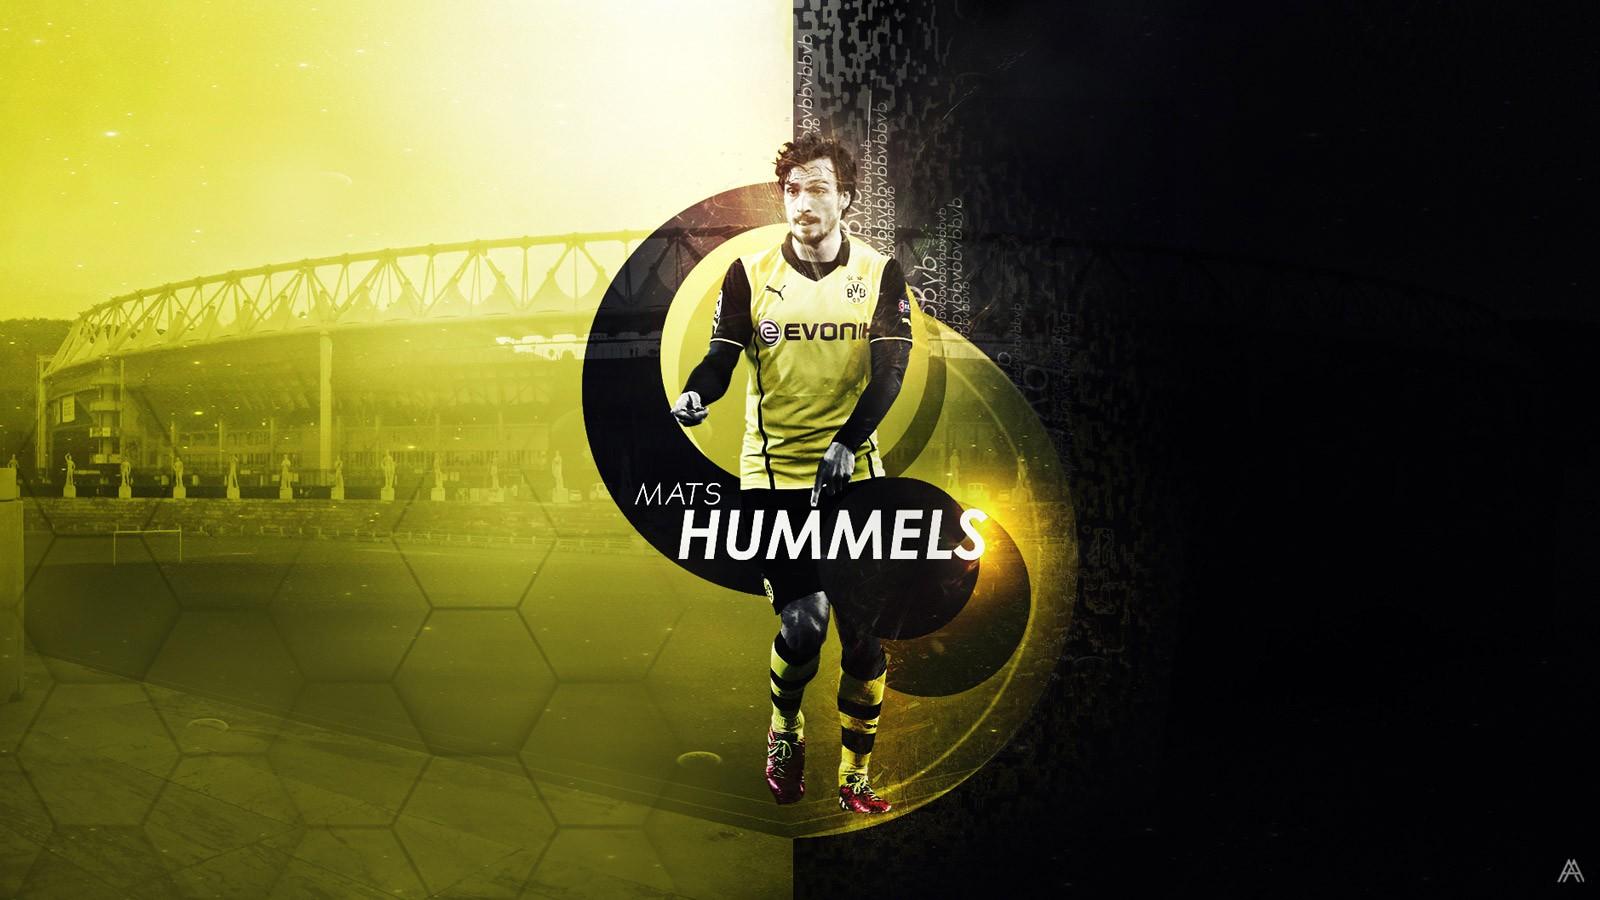 Wallpaper 1600x900 Px Borussia Dortmund Bundesliga Bvb Mats Hummels 1600x900 Goodfon 650575 Hd Wallpapers Wallhere